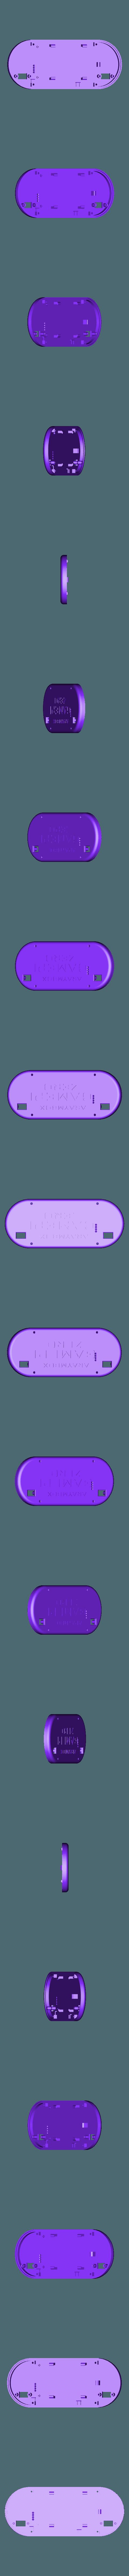 GamePi_Zero_Case_Back.stl Download free STL file GamePi Zero • 3D printer template, araymbox